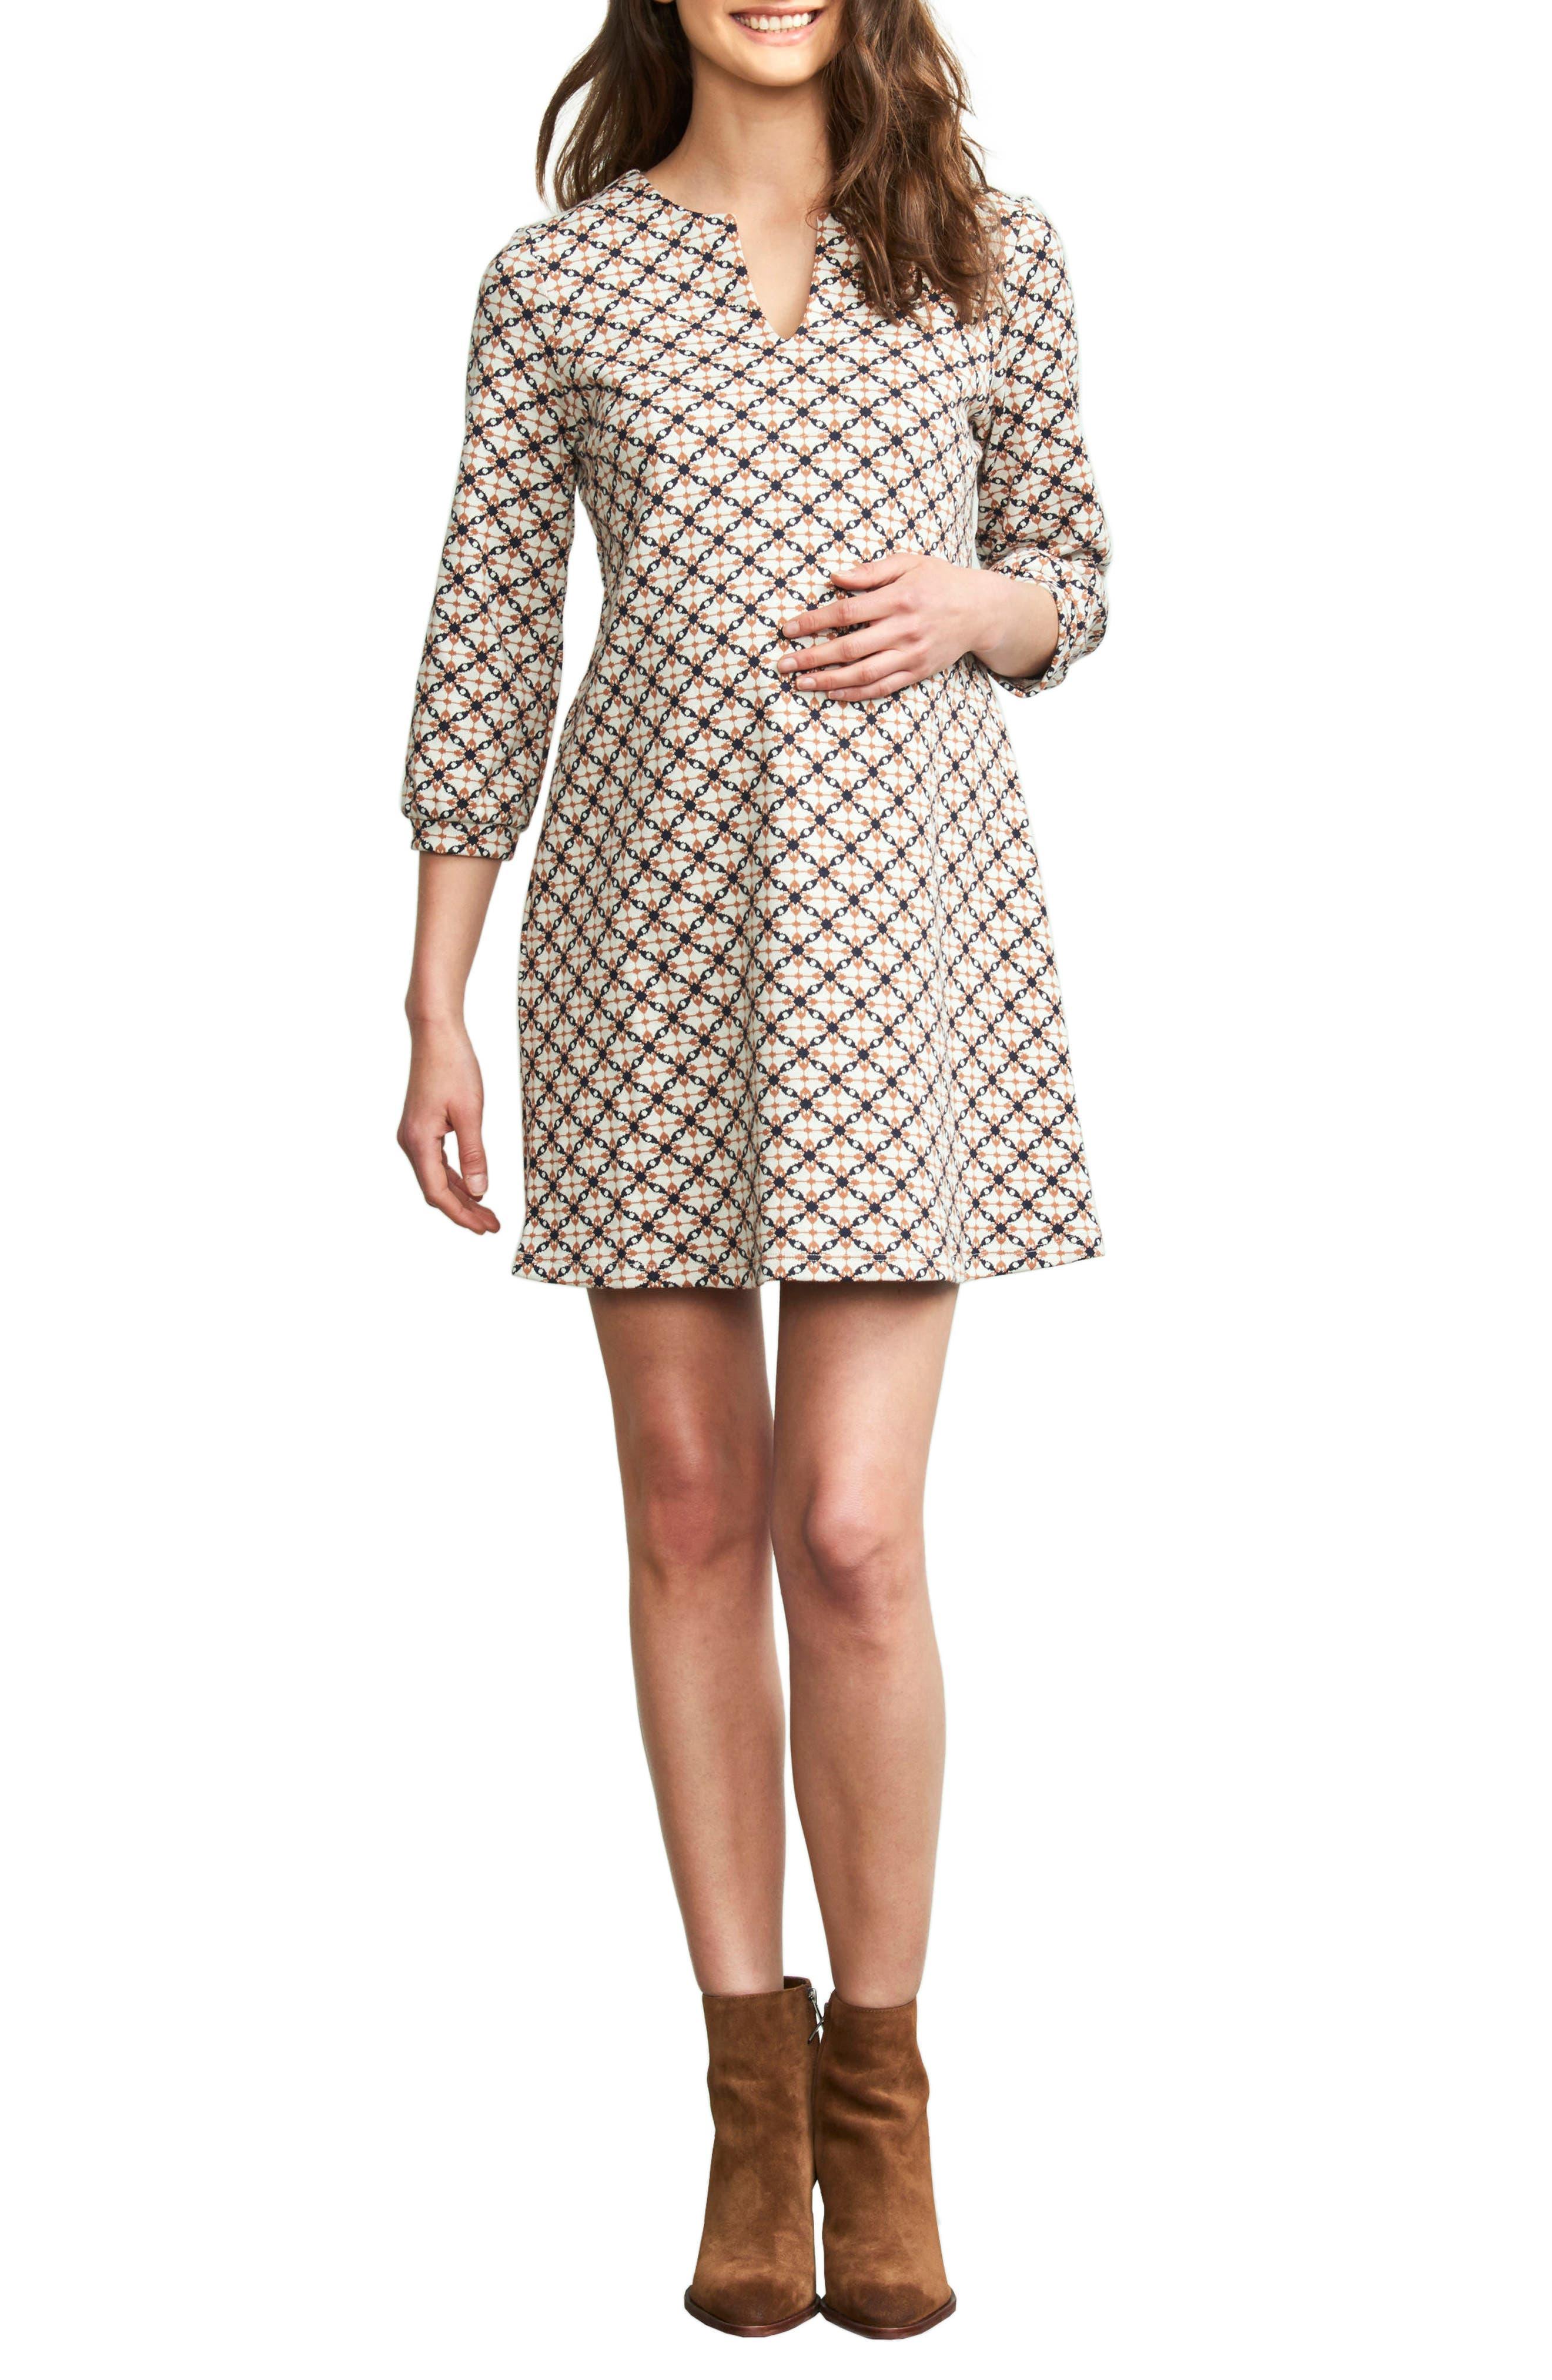 MATERNAL AMERICA, 'Vintage Pearls' Maternity Dress, Main thumbnail 1, color, JACQUARD